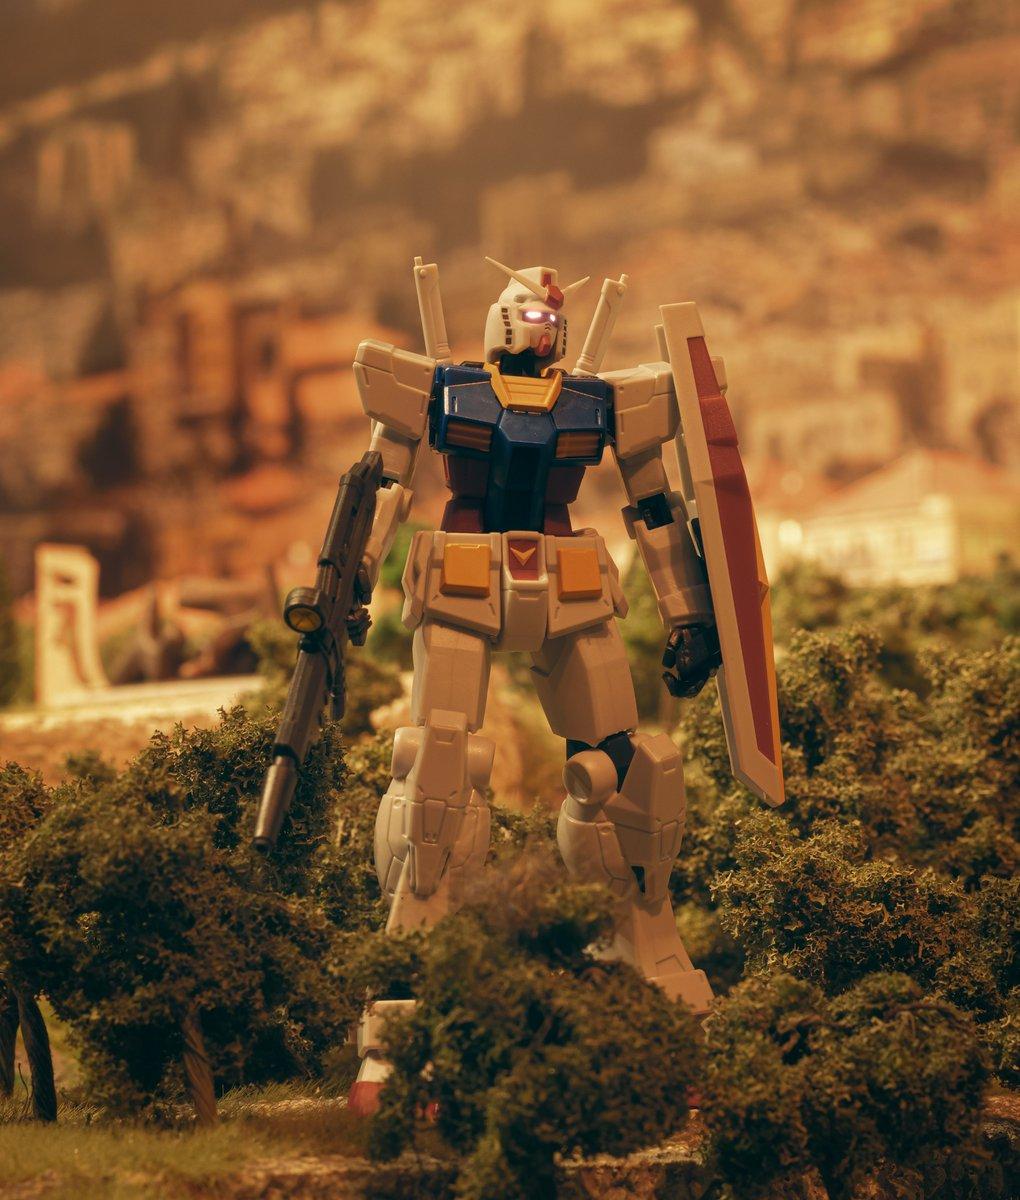 Continuing my collaboration with @Gulliversgate , Gundam Universe RX-78-2 fits right into their Middle East exhibit   For more http://www.instagram.com/ShootingtheGalaxy…   #toyphotography #gundam #gundamtheorigin #gundamuniverse #bandai #bluefinbrands